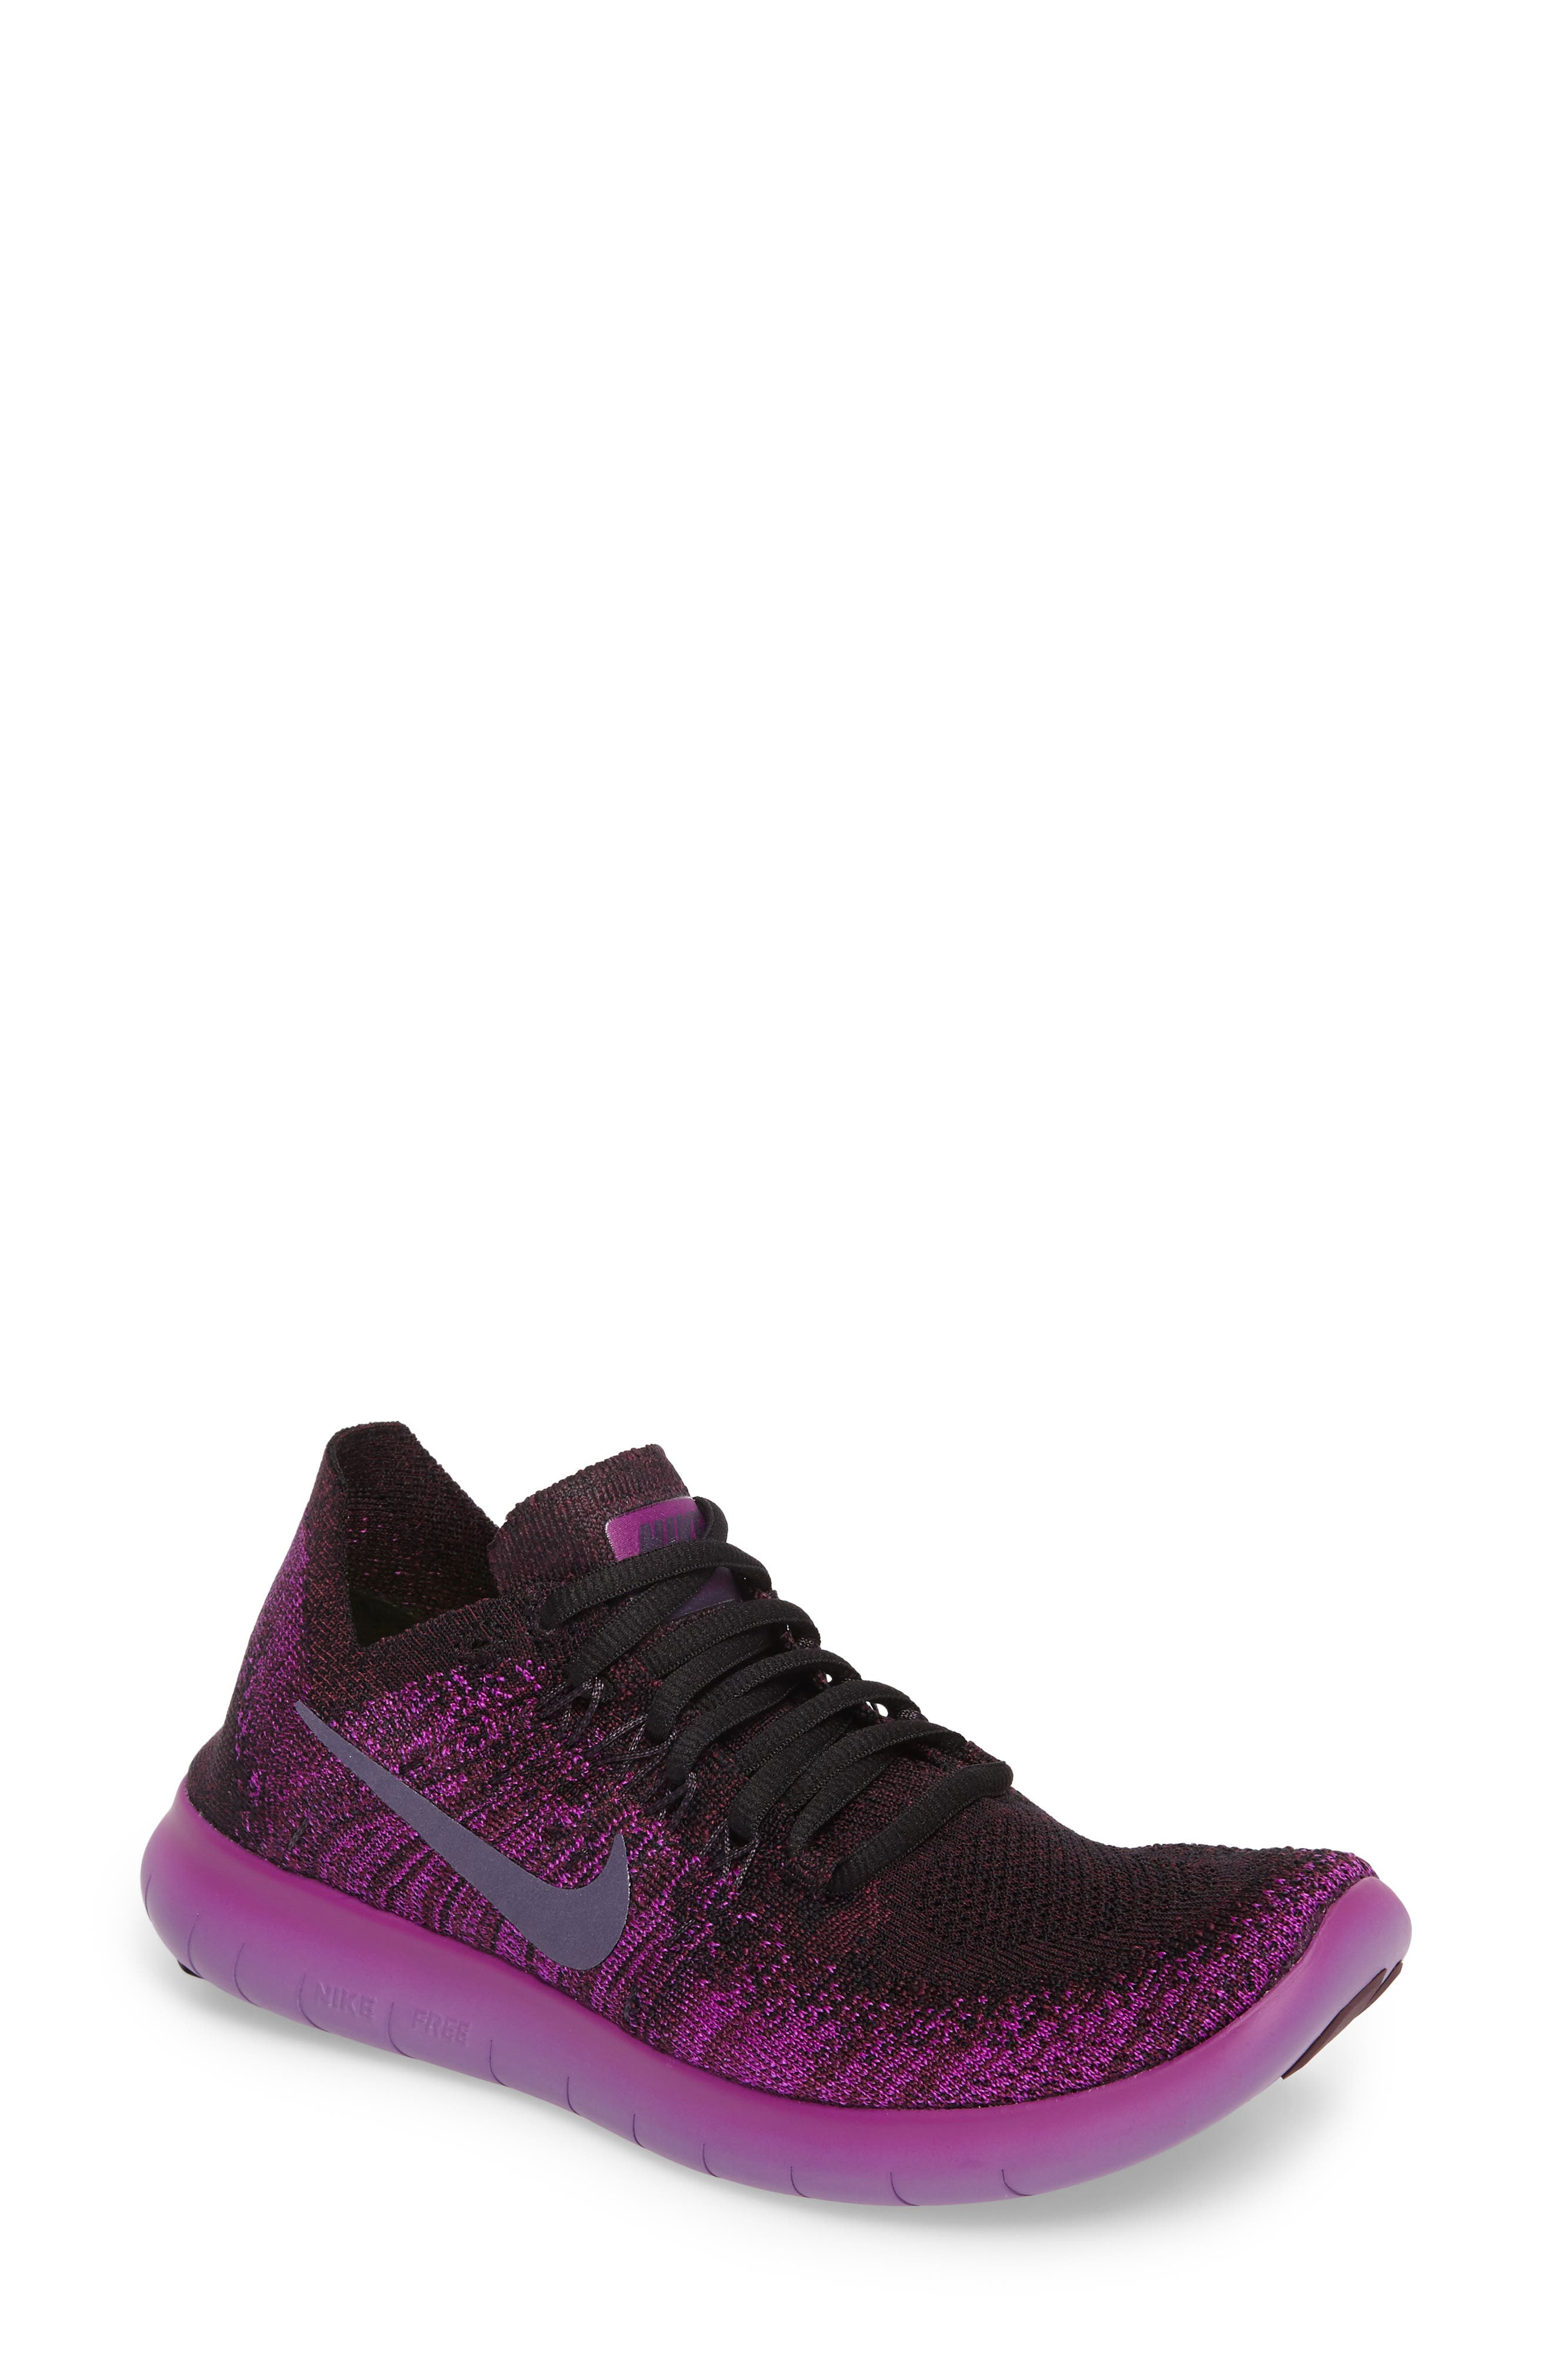 Alternate Image 1 Selected - Nike Free Run Flyknit 2 Running Shoe (Women)